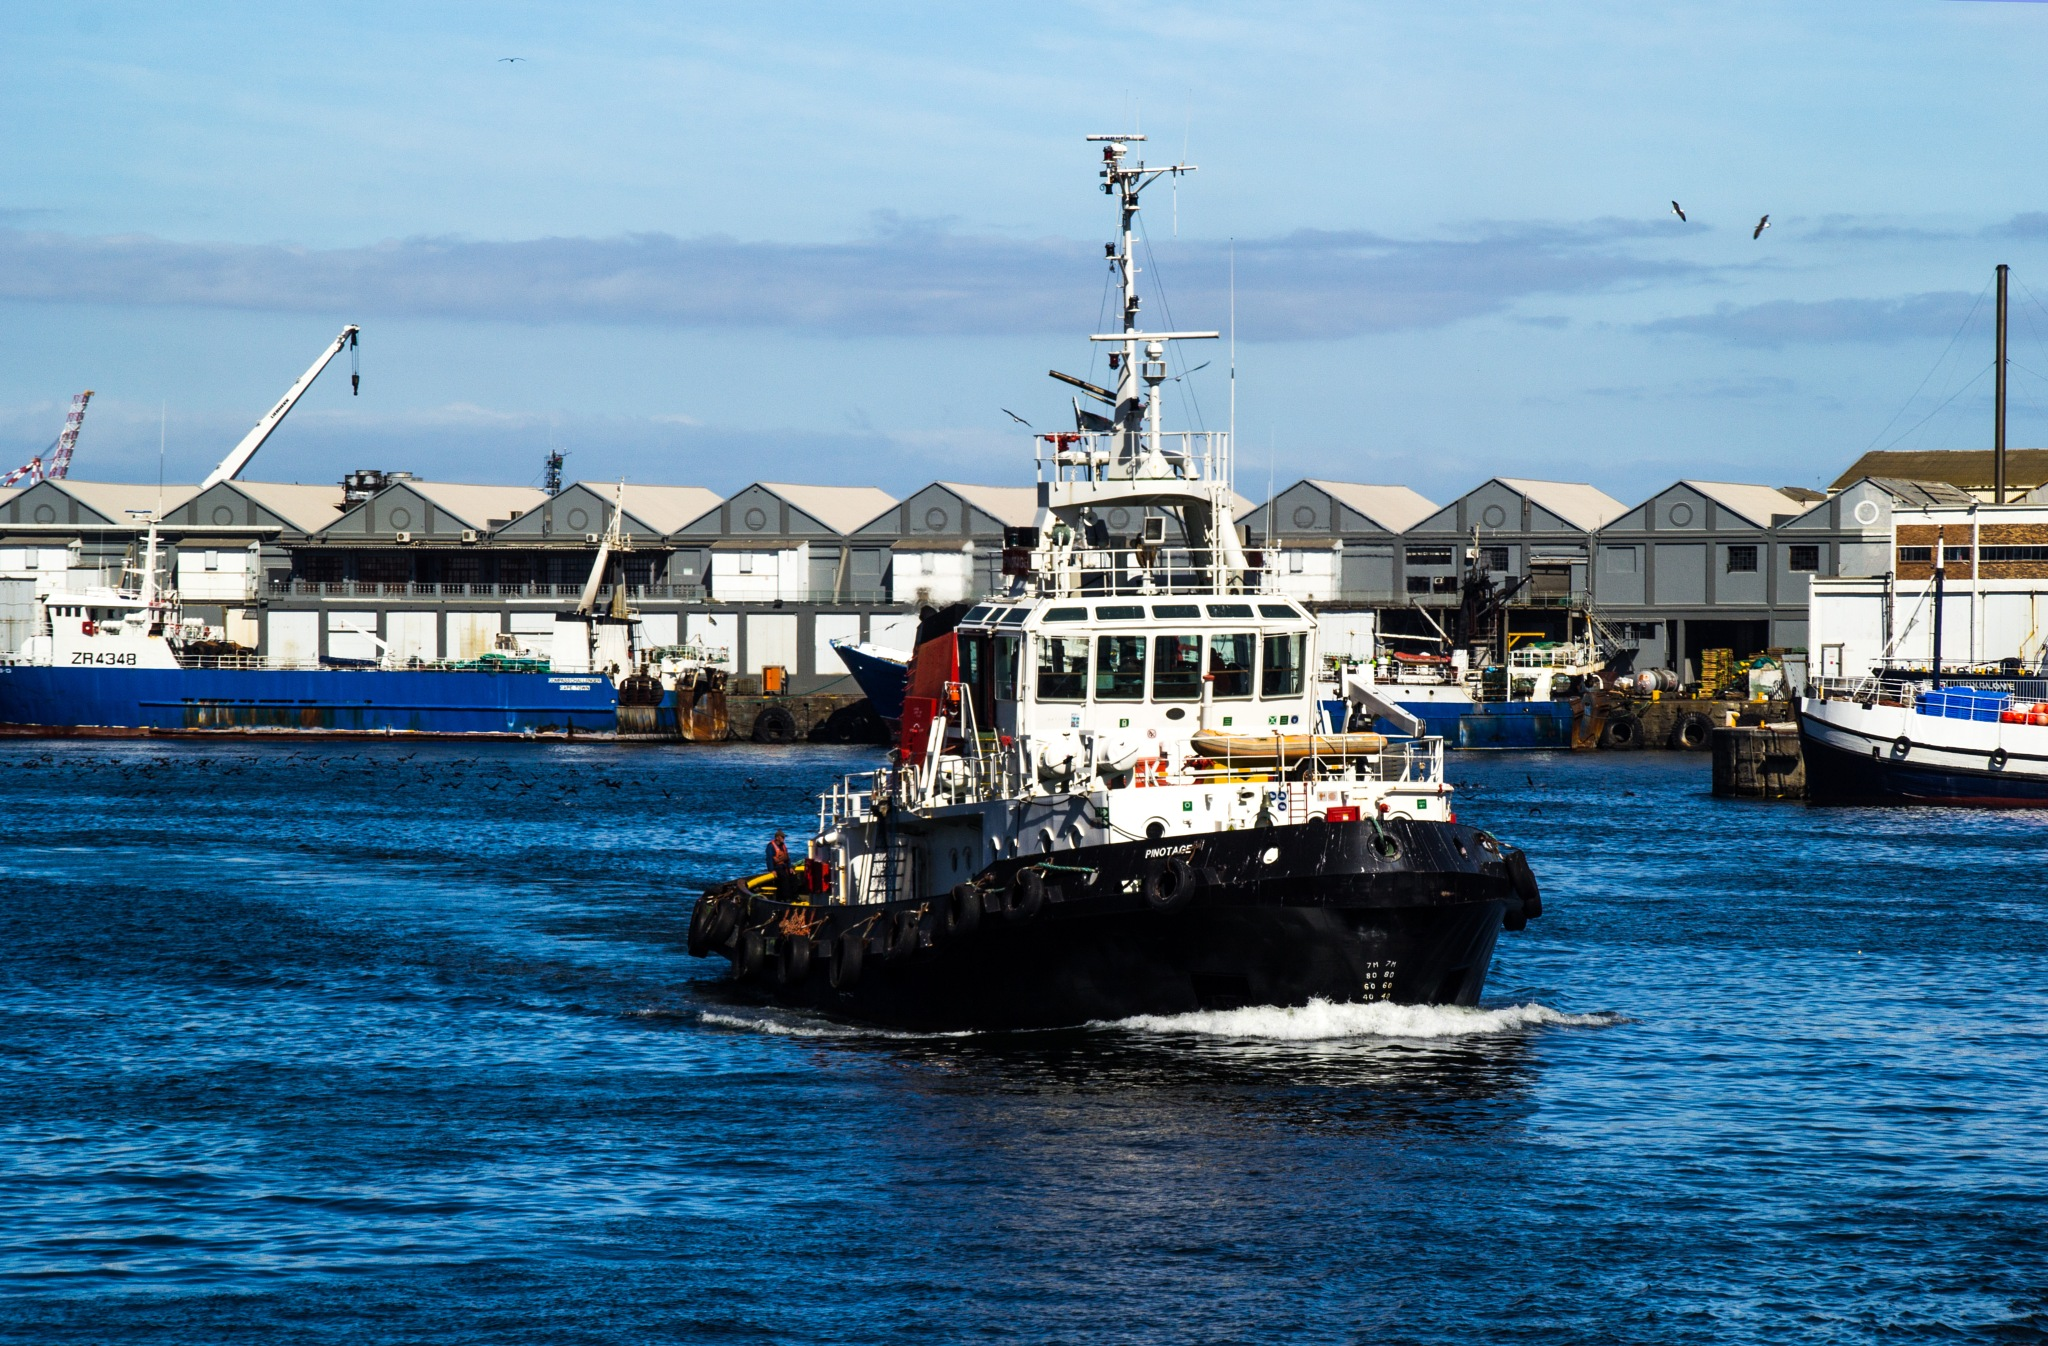 Tug boat by Nauta Piscatorque